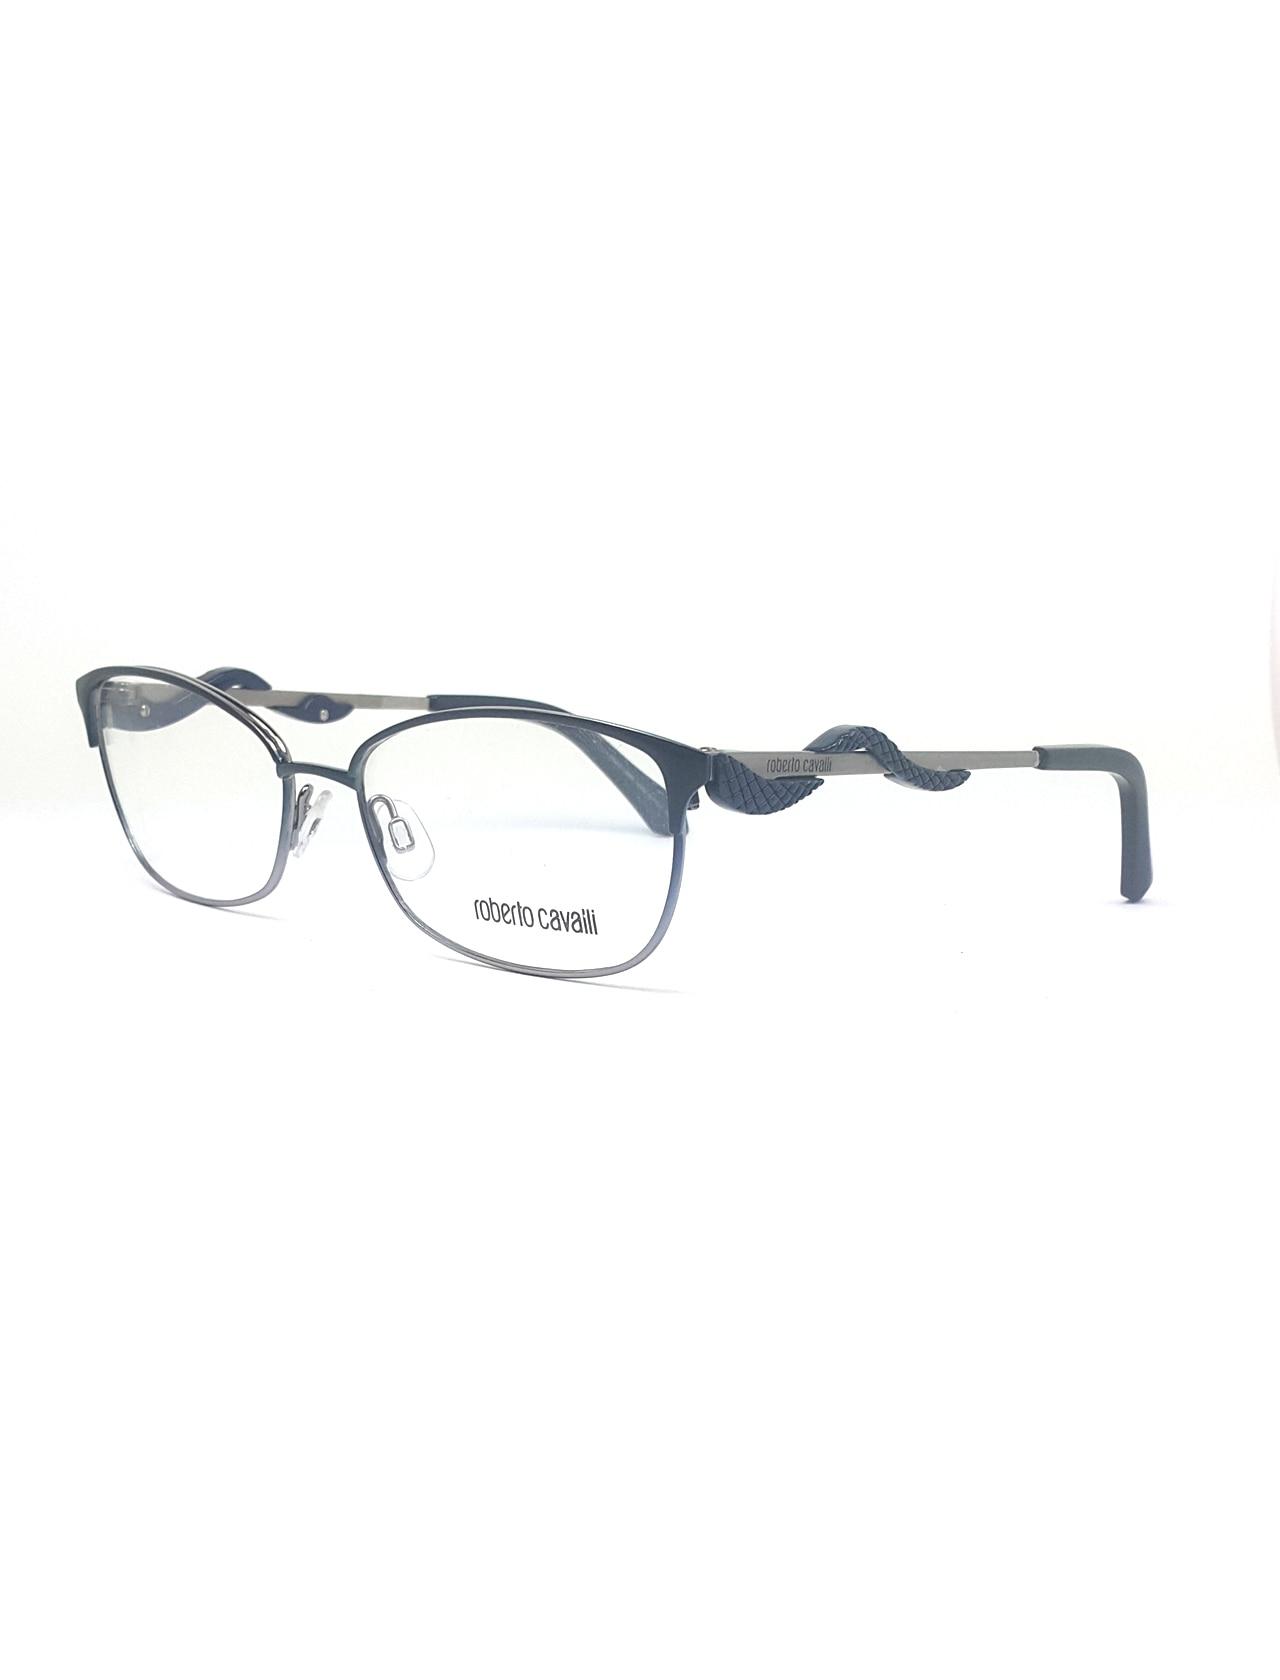 Markamilla Women Reading Glasses Frame Demo Glasses Eyewear Transparent High Quality WomenRoberto Cavalli RC 5006 092